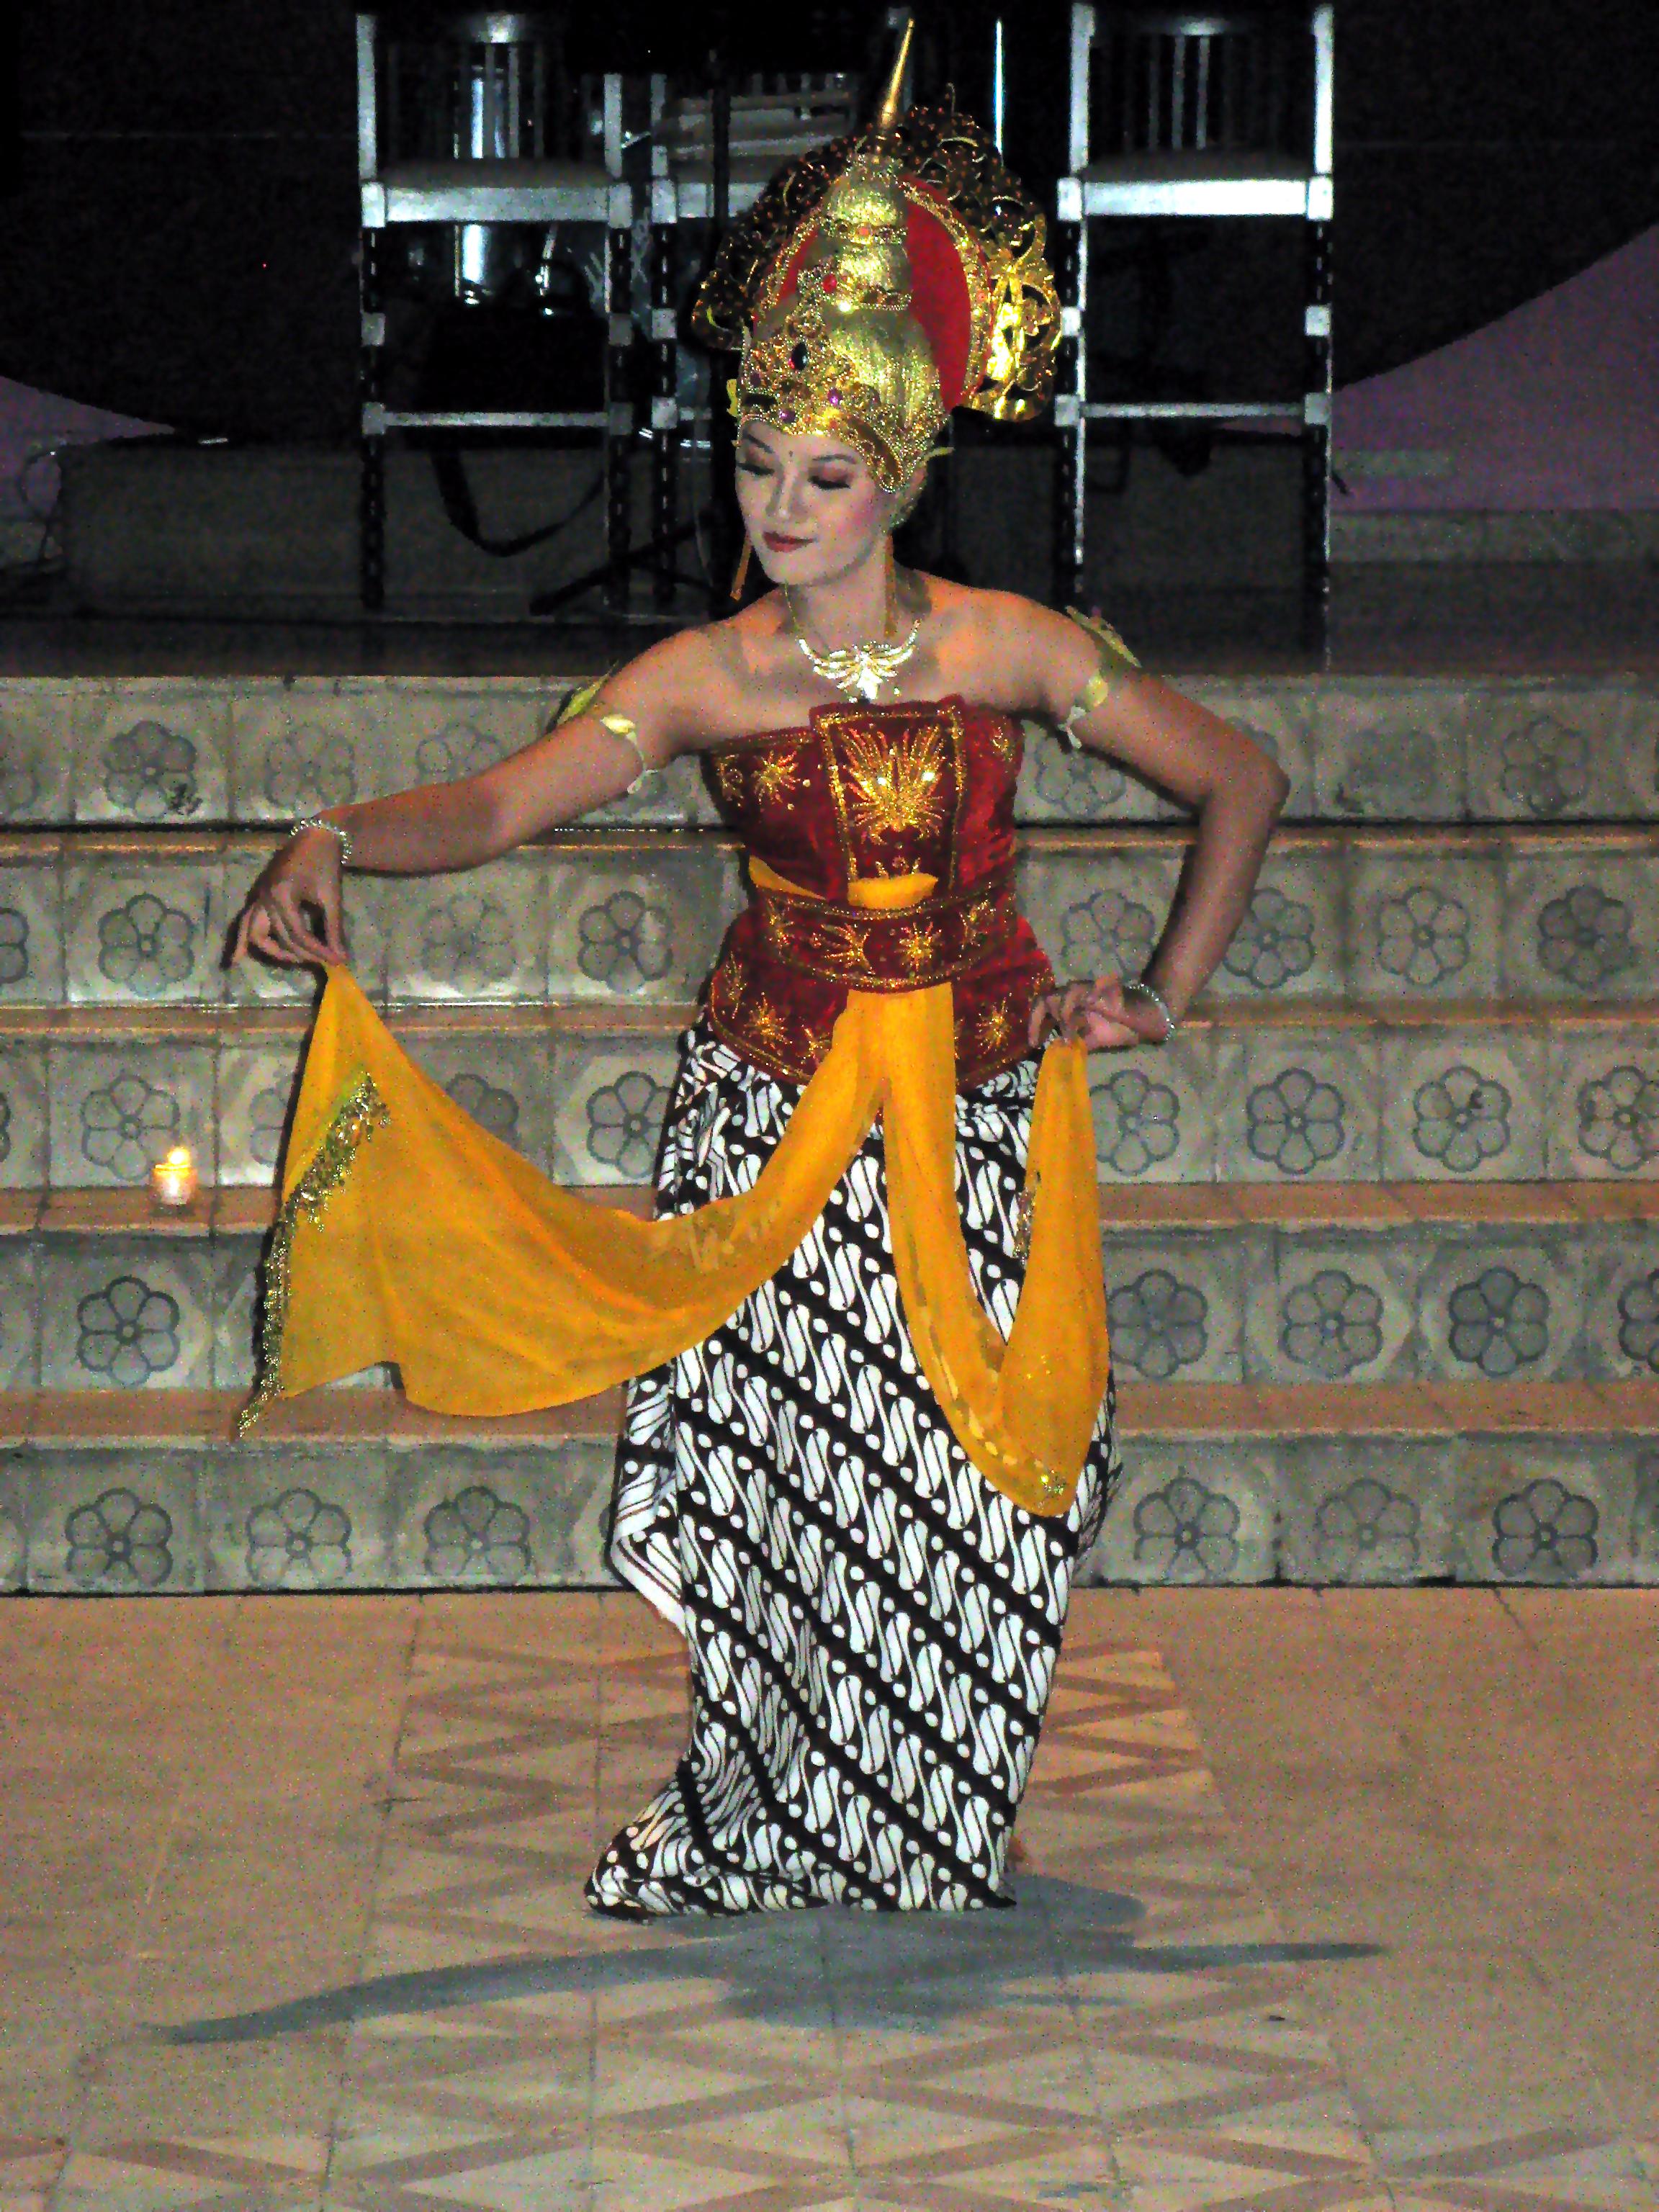 File Courtship Dance Malang East Java 1319 Jpg Wikimedia Commons